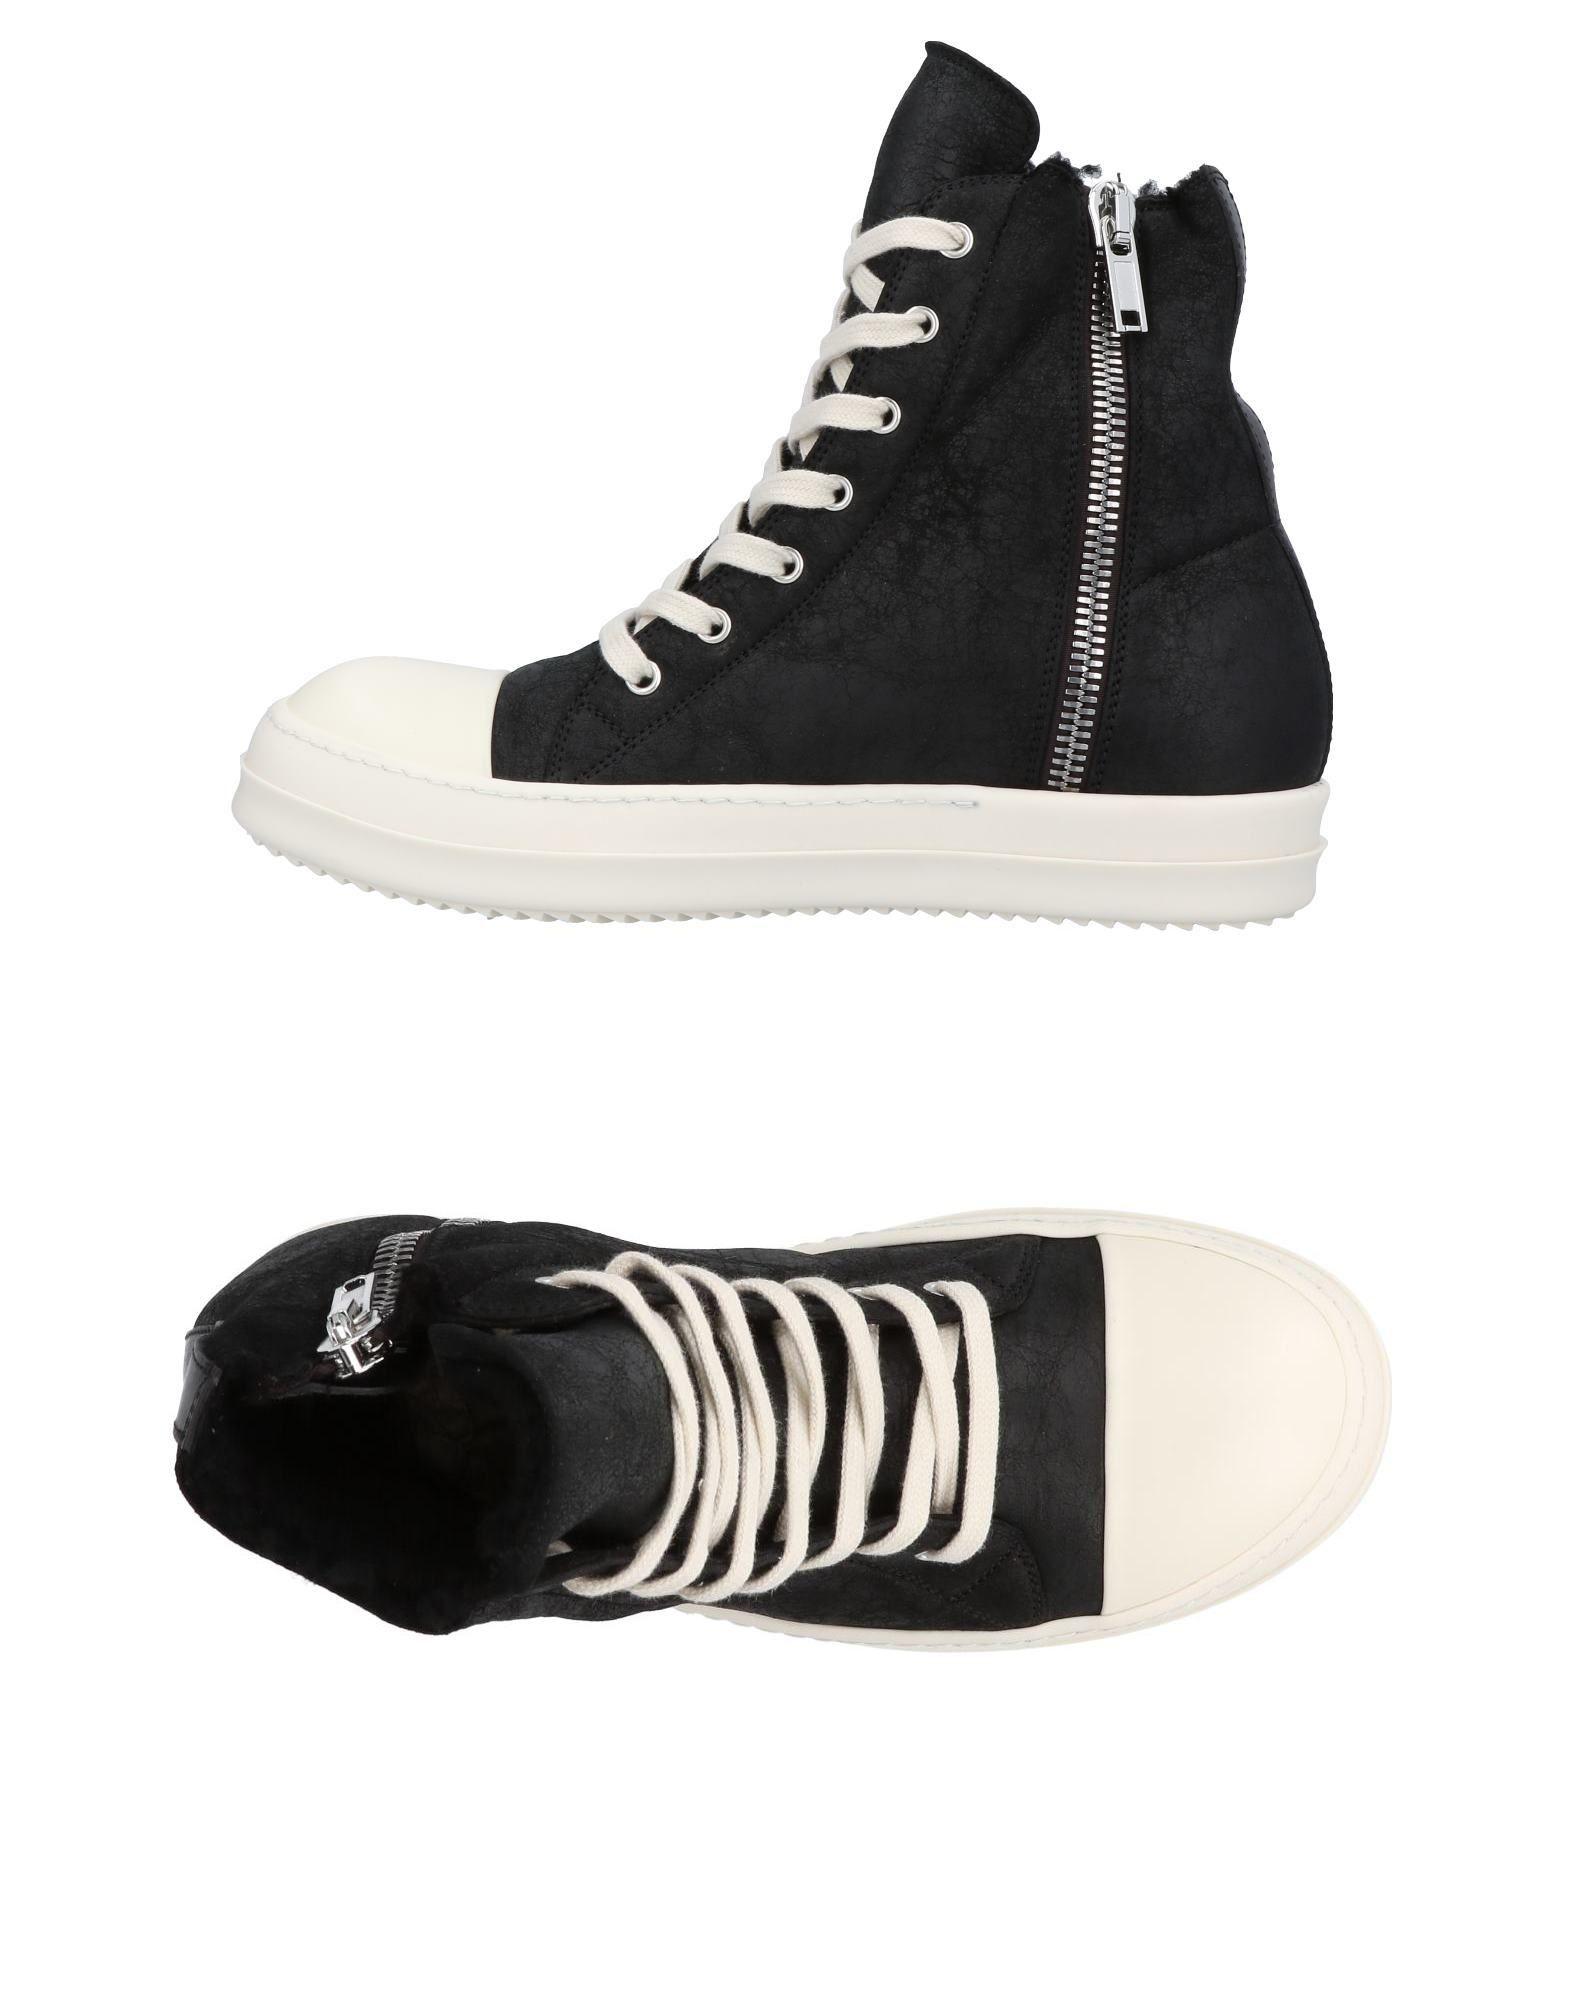 Rick Owens Sneakers - Men Men Men Rick Owens Sneakers online on  Canada - 11452576VW adf751